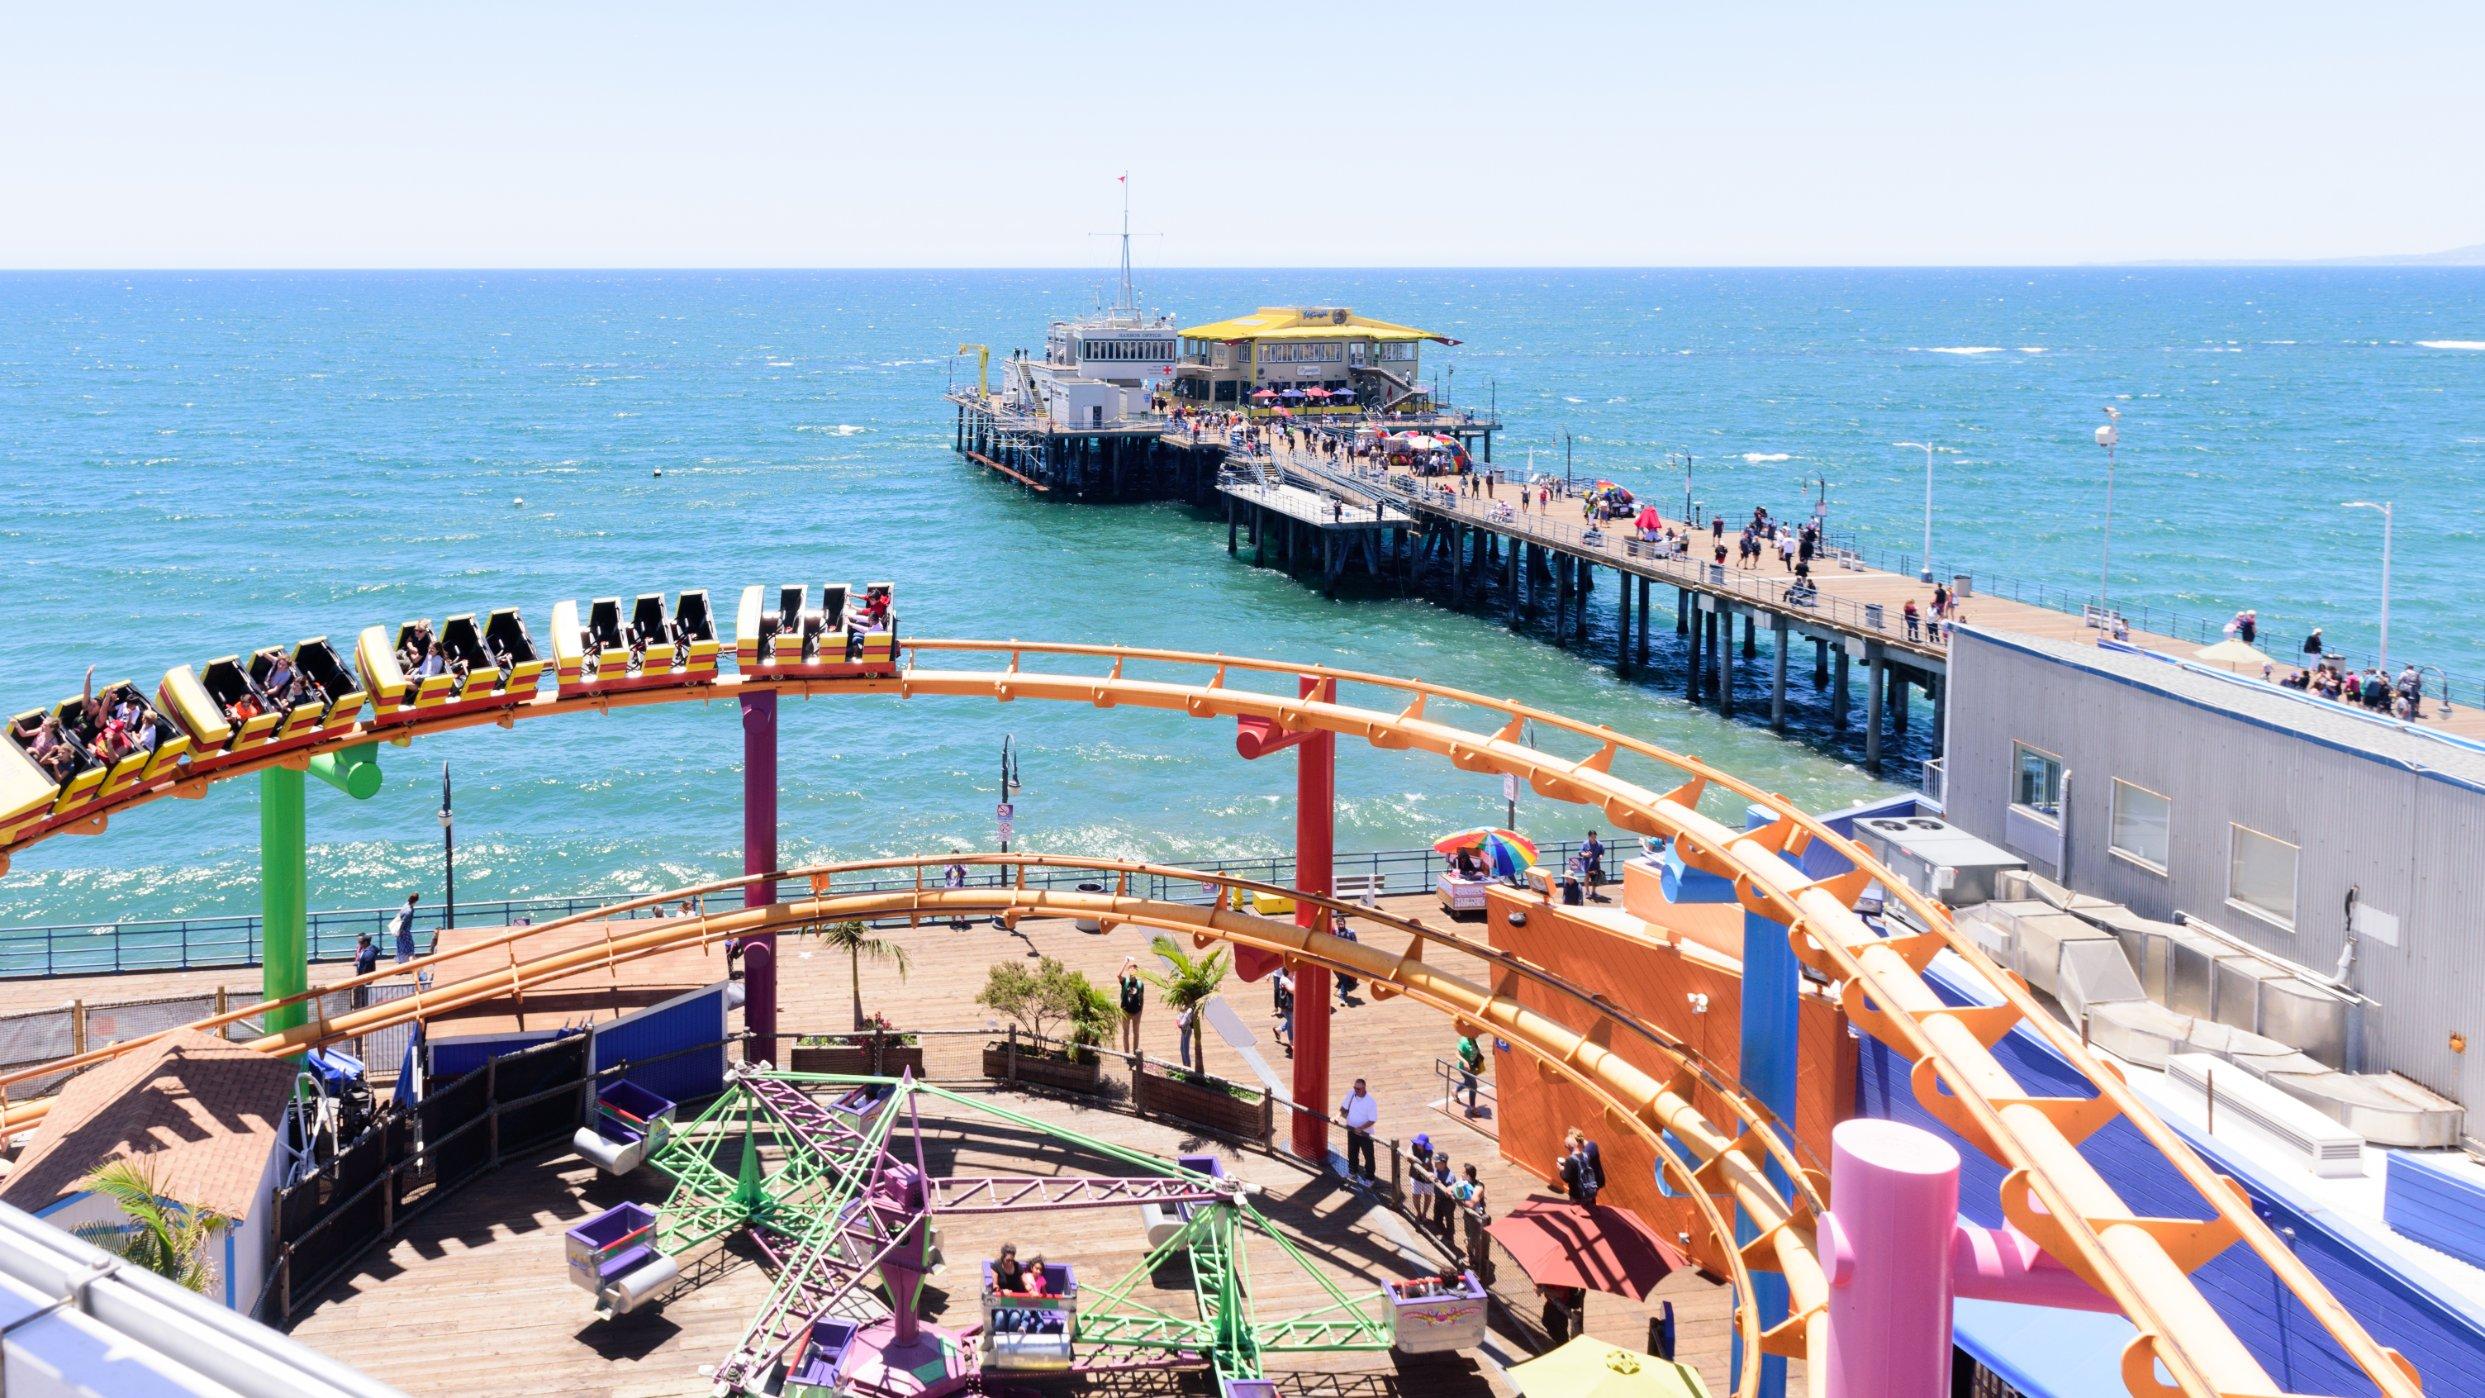 3rd Street Promenade Hours >> Santa Monica Pier Tips Good Advice For Your Visit Cnn Travel